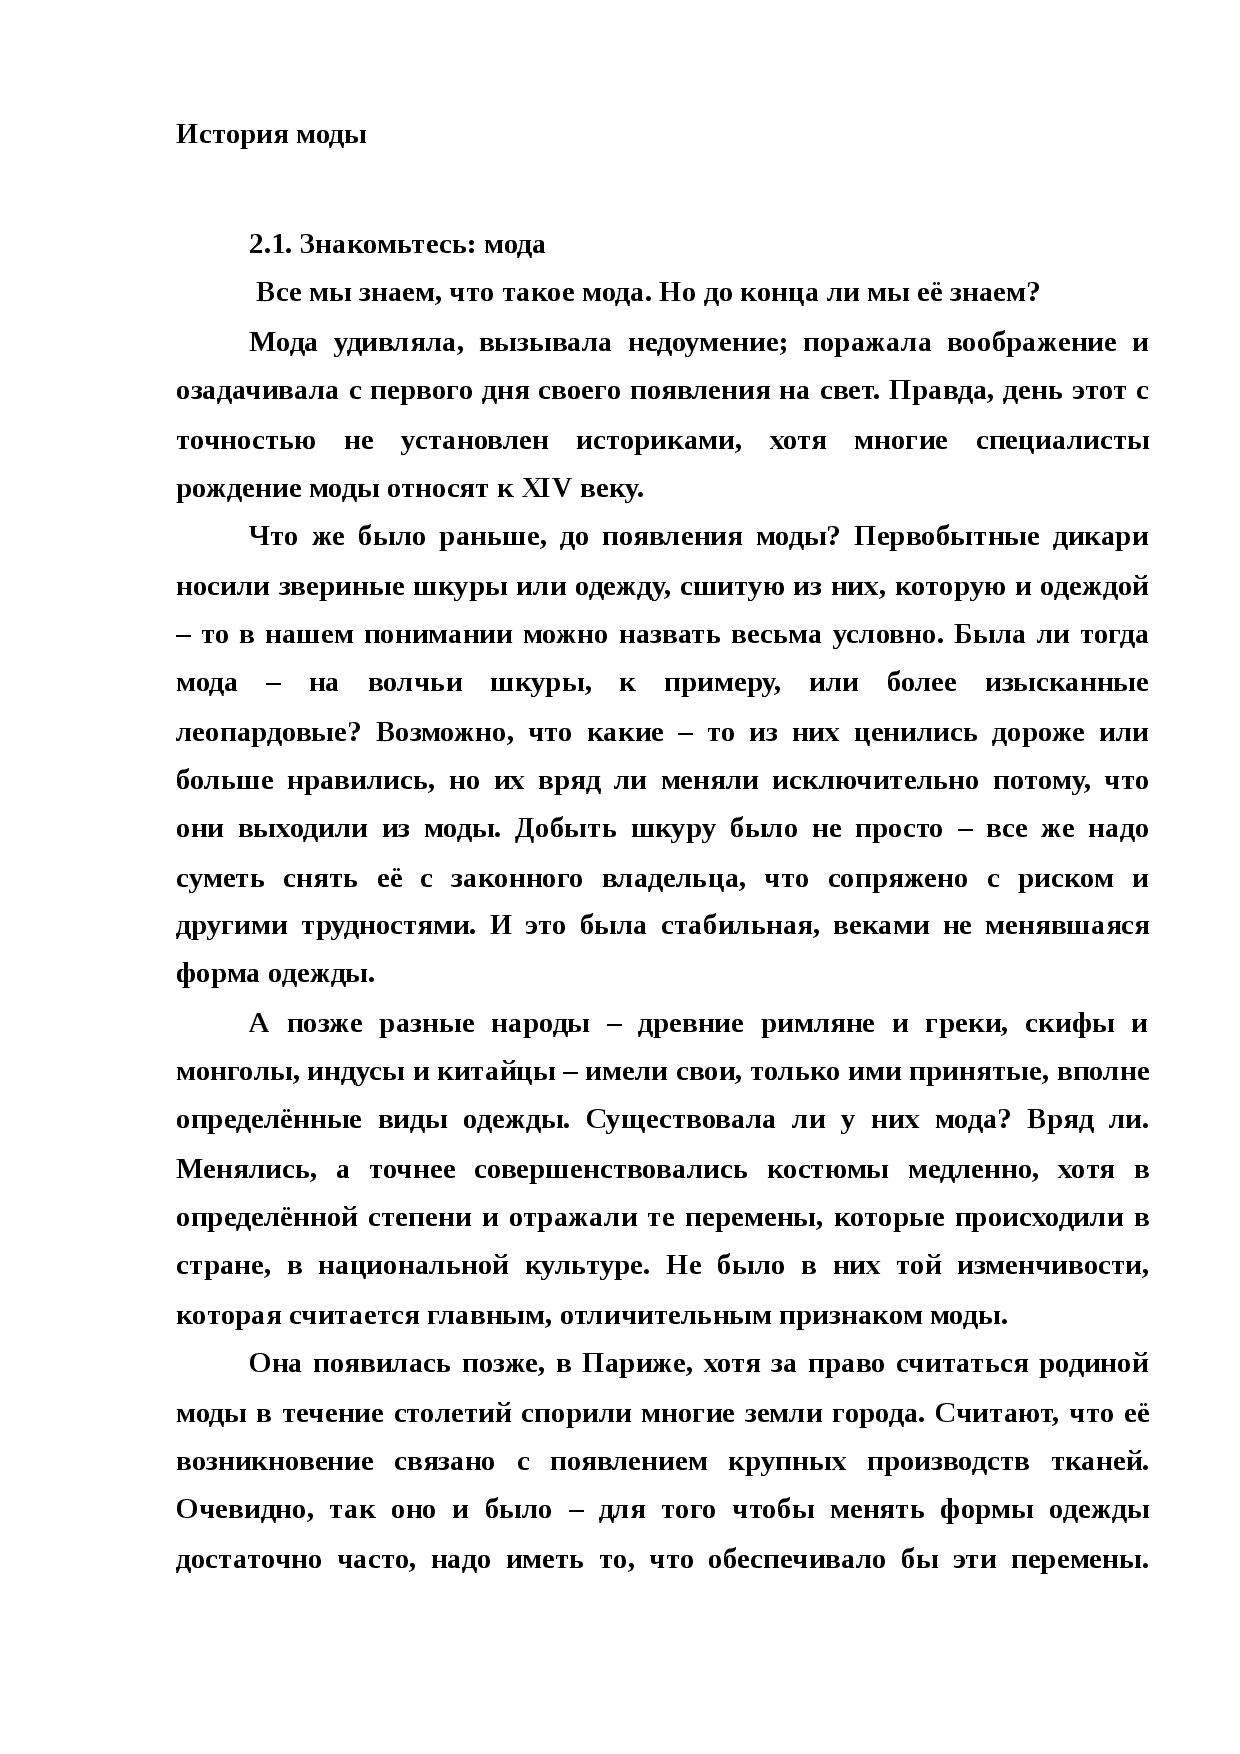 Скачать моды для майнкрафт | ? minerussia.ru